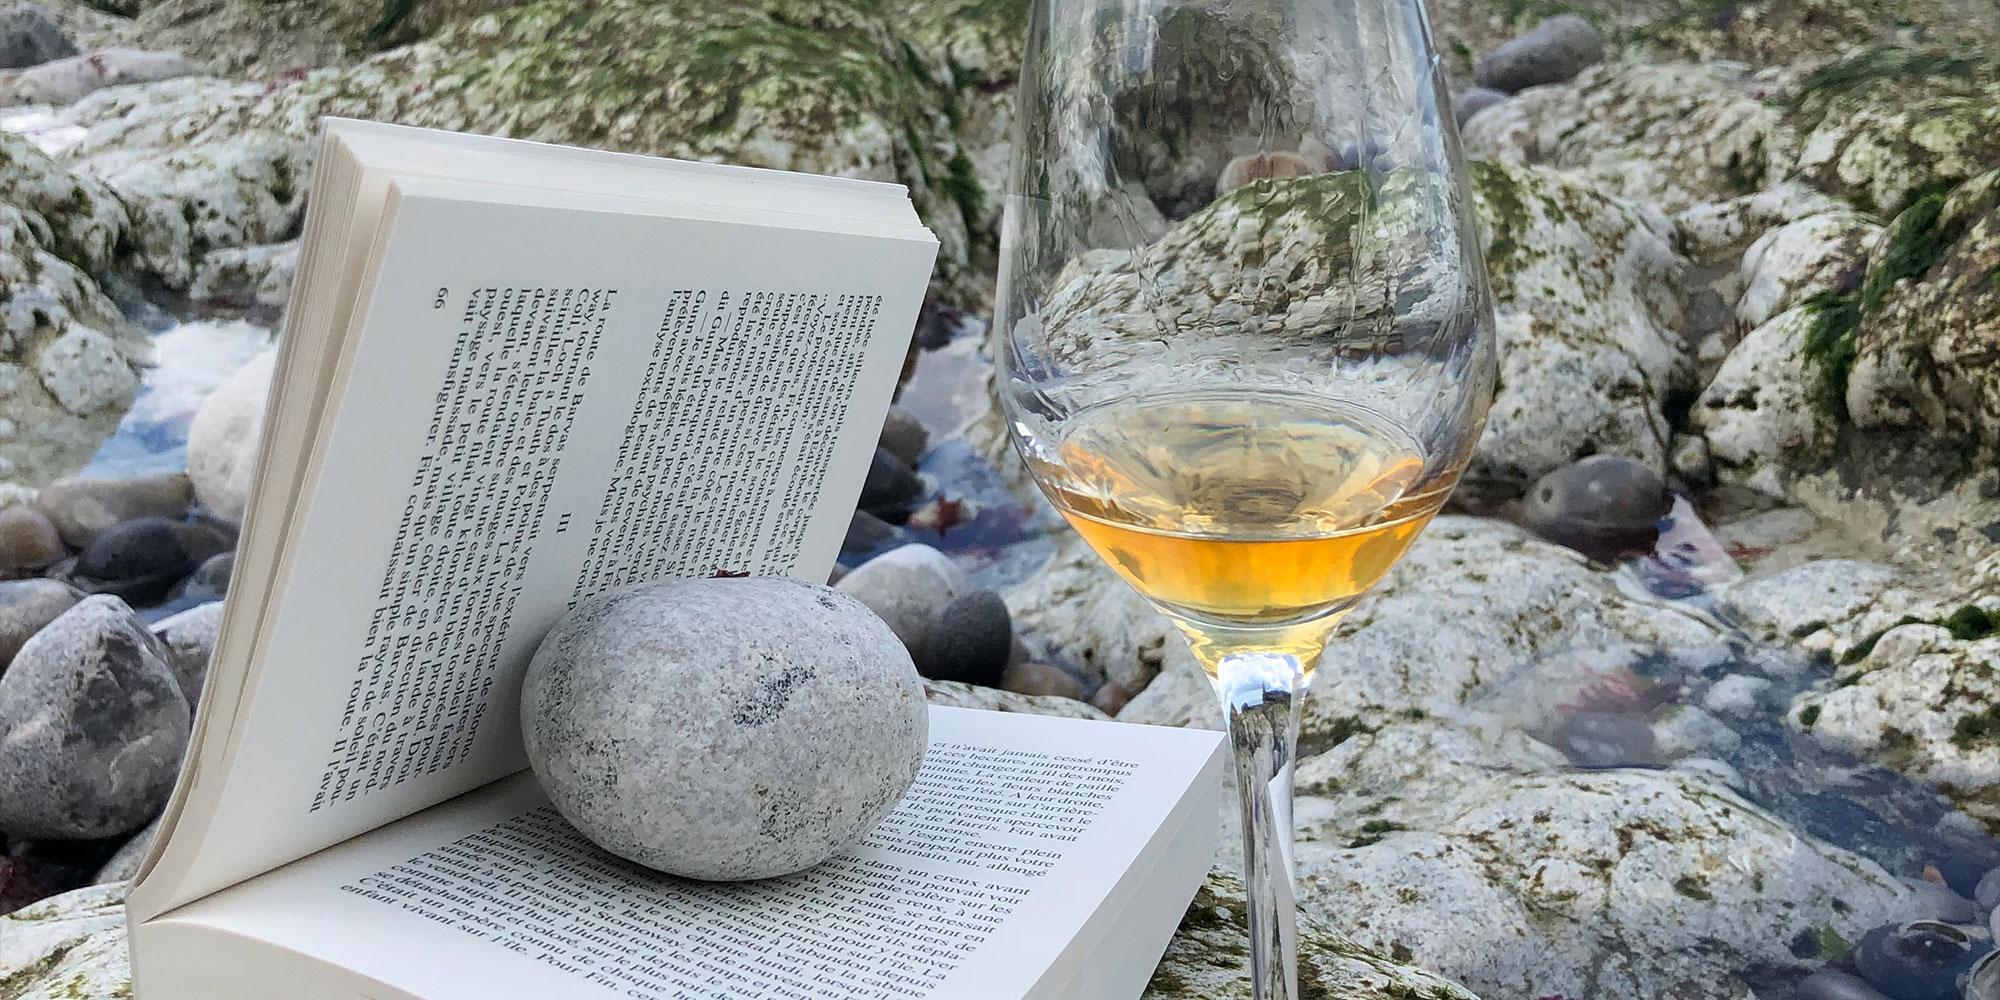 caves bérigny plaisir degustations vins